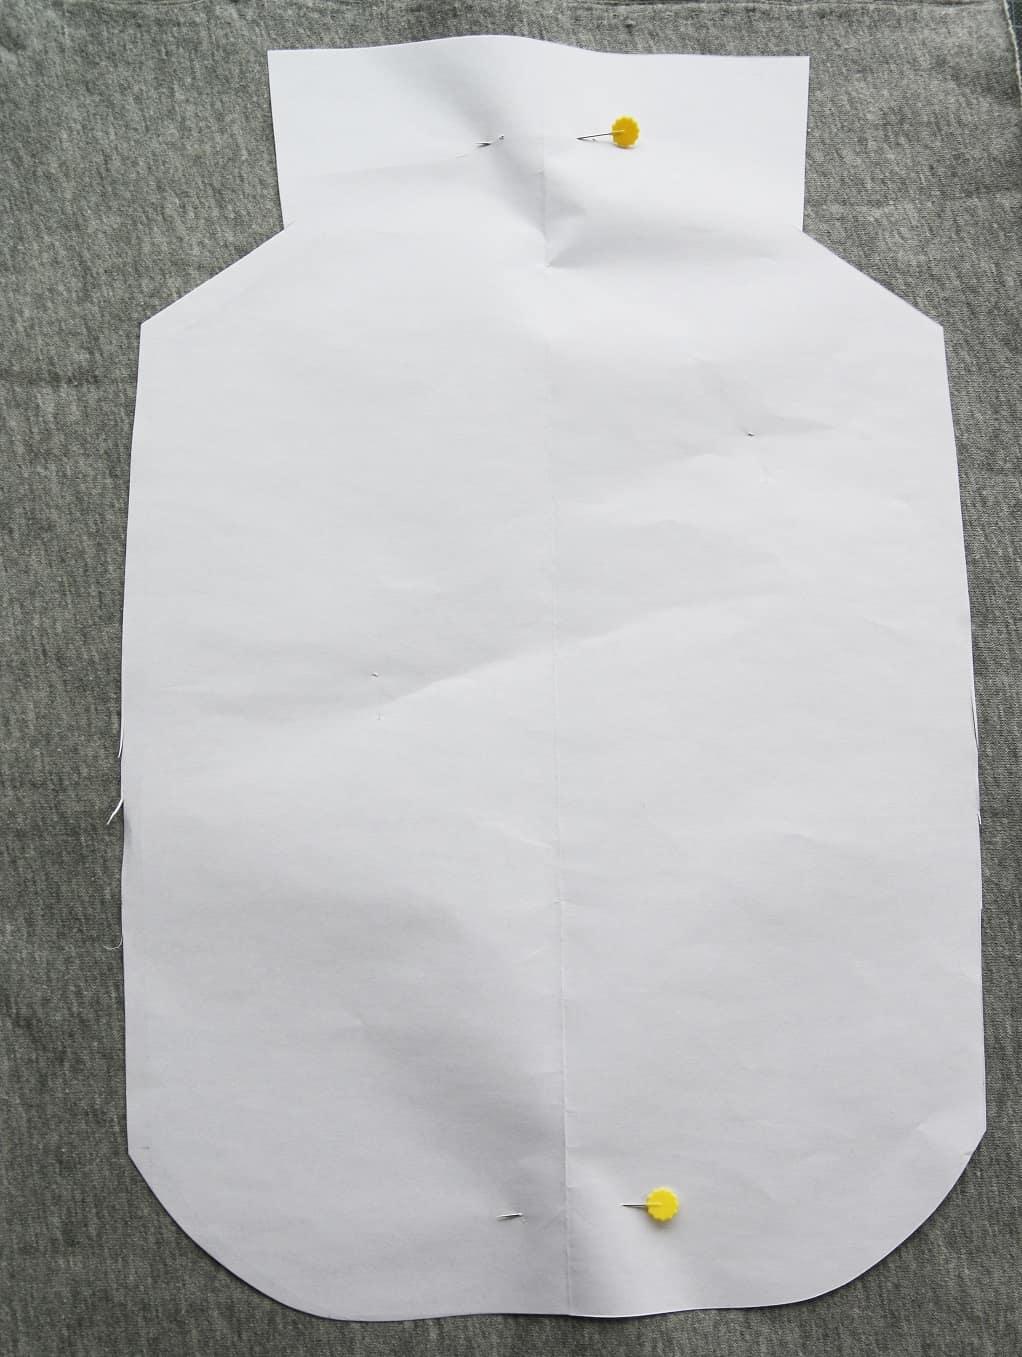 Wäörmflaschen-Bezug nähen: Grundform ausschneiden.